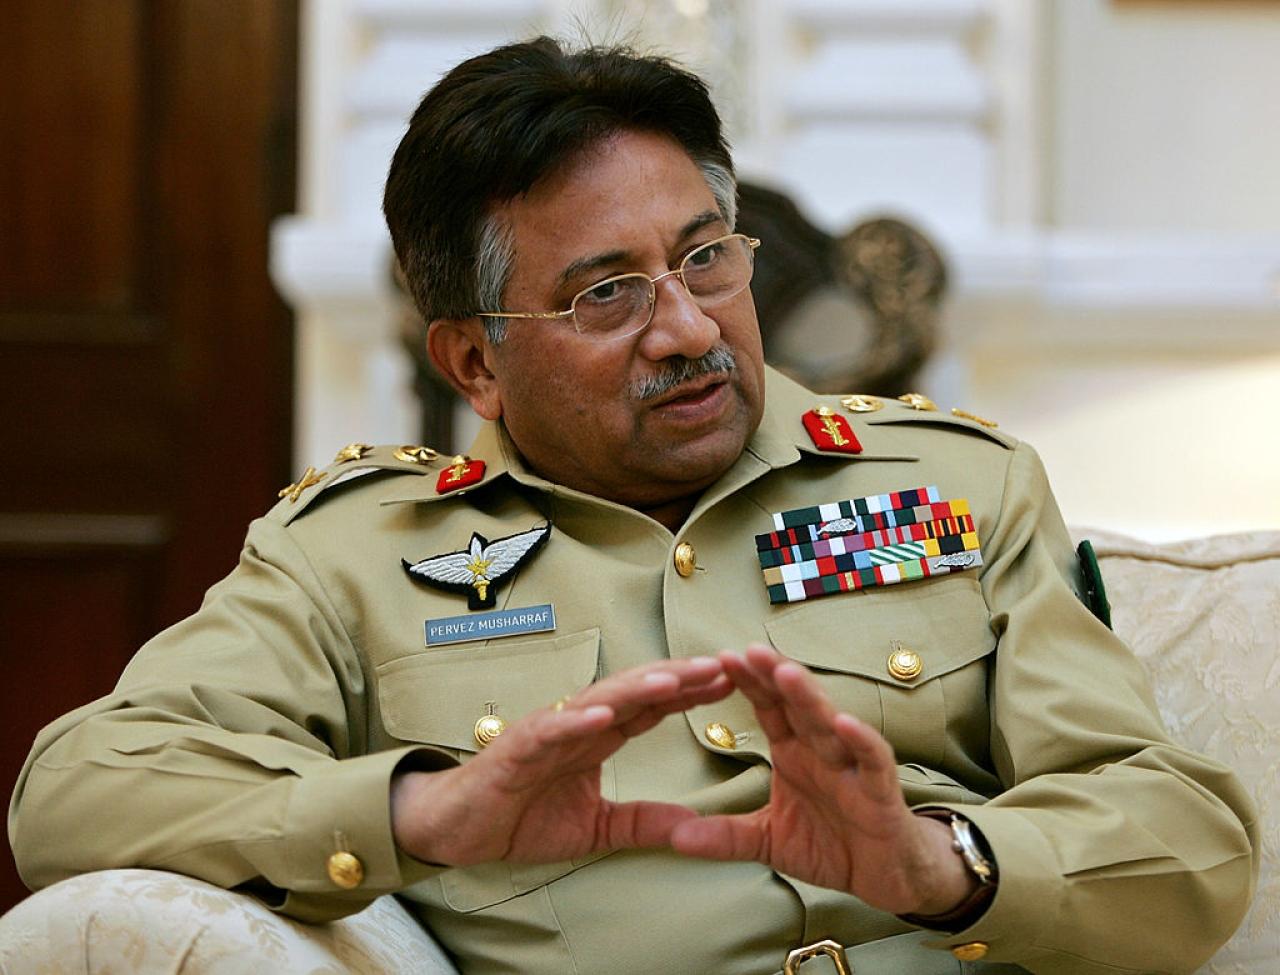 Former Pakistani president Pervez Musharraf talks with media representatives at his camp office in Rawalpindi. (AAMIR QURESHI/AFP/Getty Images)